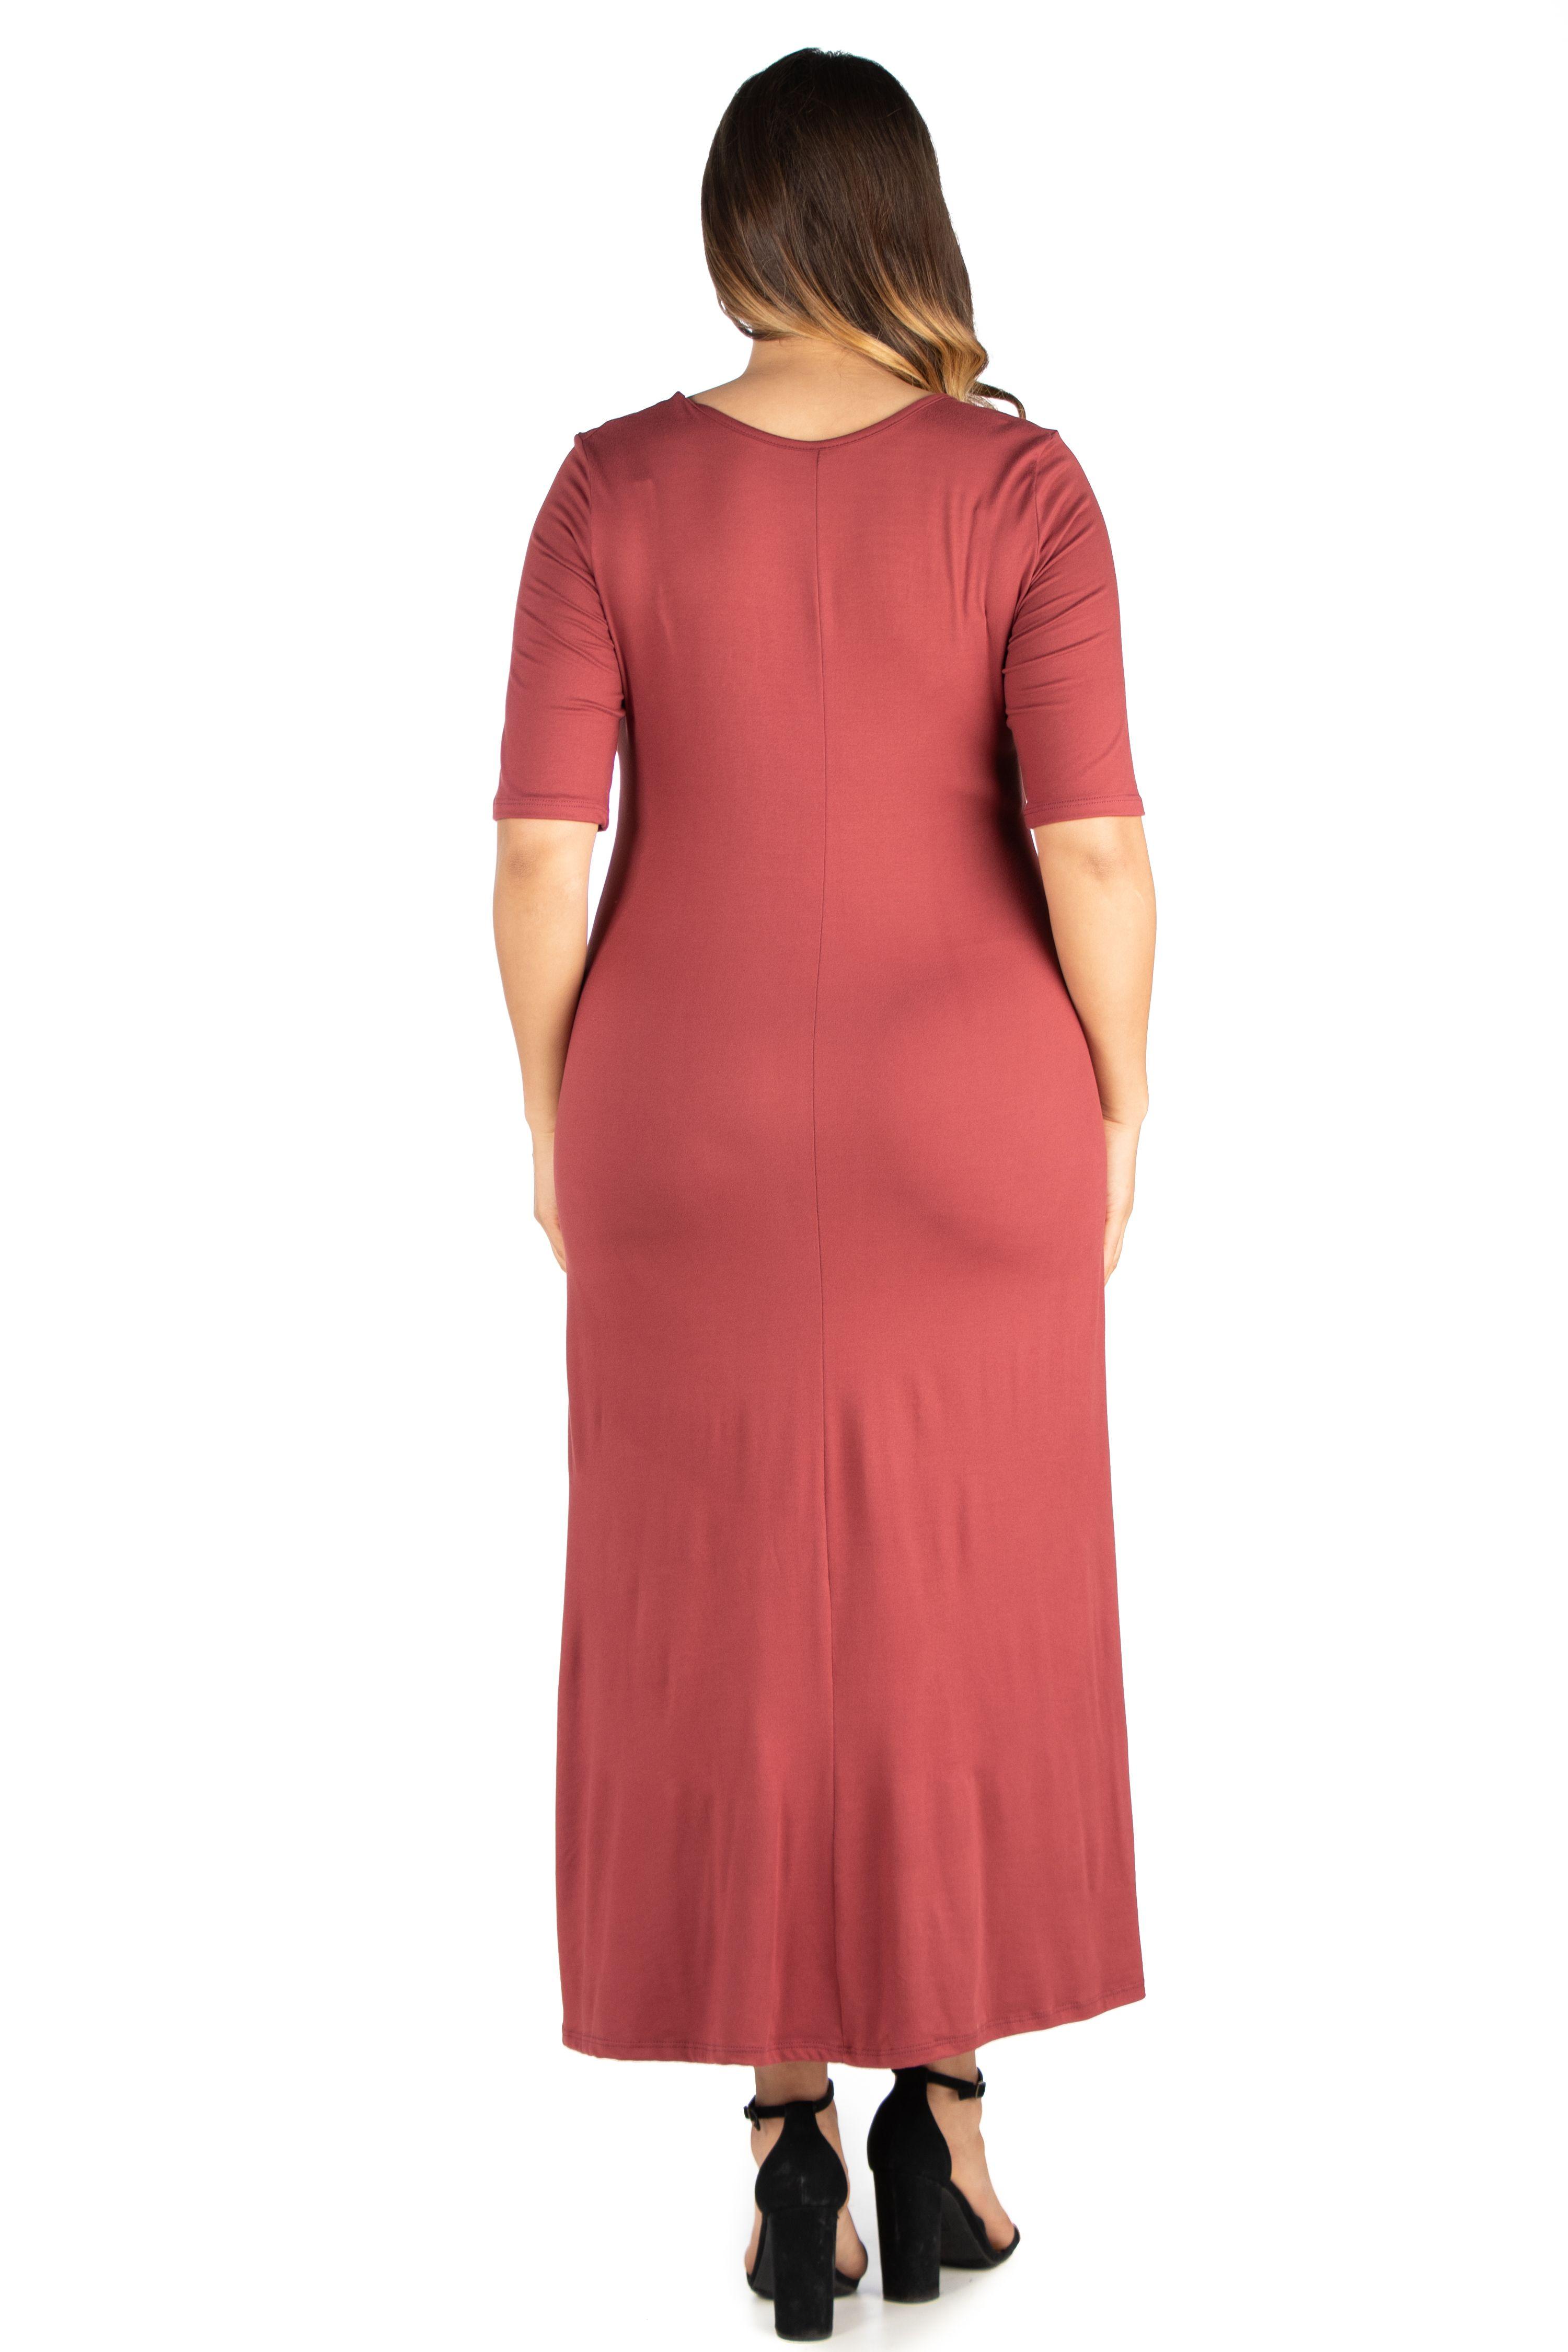 24 7 Comfort Apparel 24 7 Women S Plus Size Comfort Apparel Elbow Length Sleeve Plus Size Maxi Dress Walmart Com Plus Size Maxi Dresses Maxi Dress With Sleeves Maxi Dress [ 4500 x 3000 Pixel ]